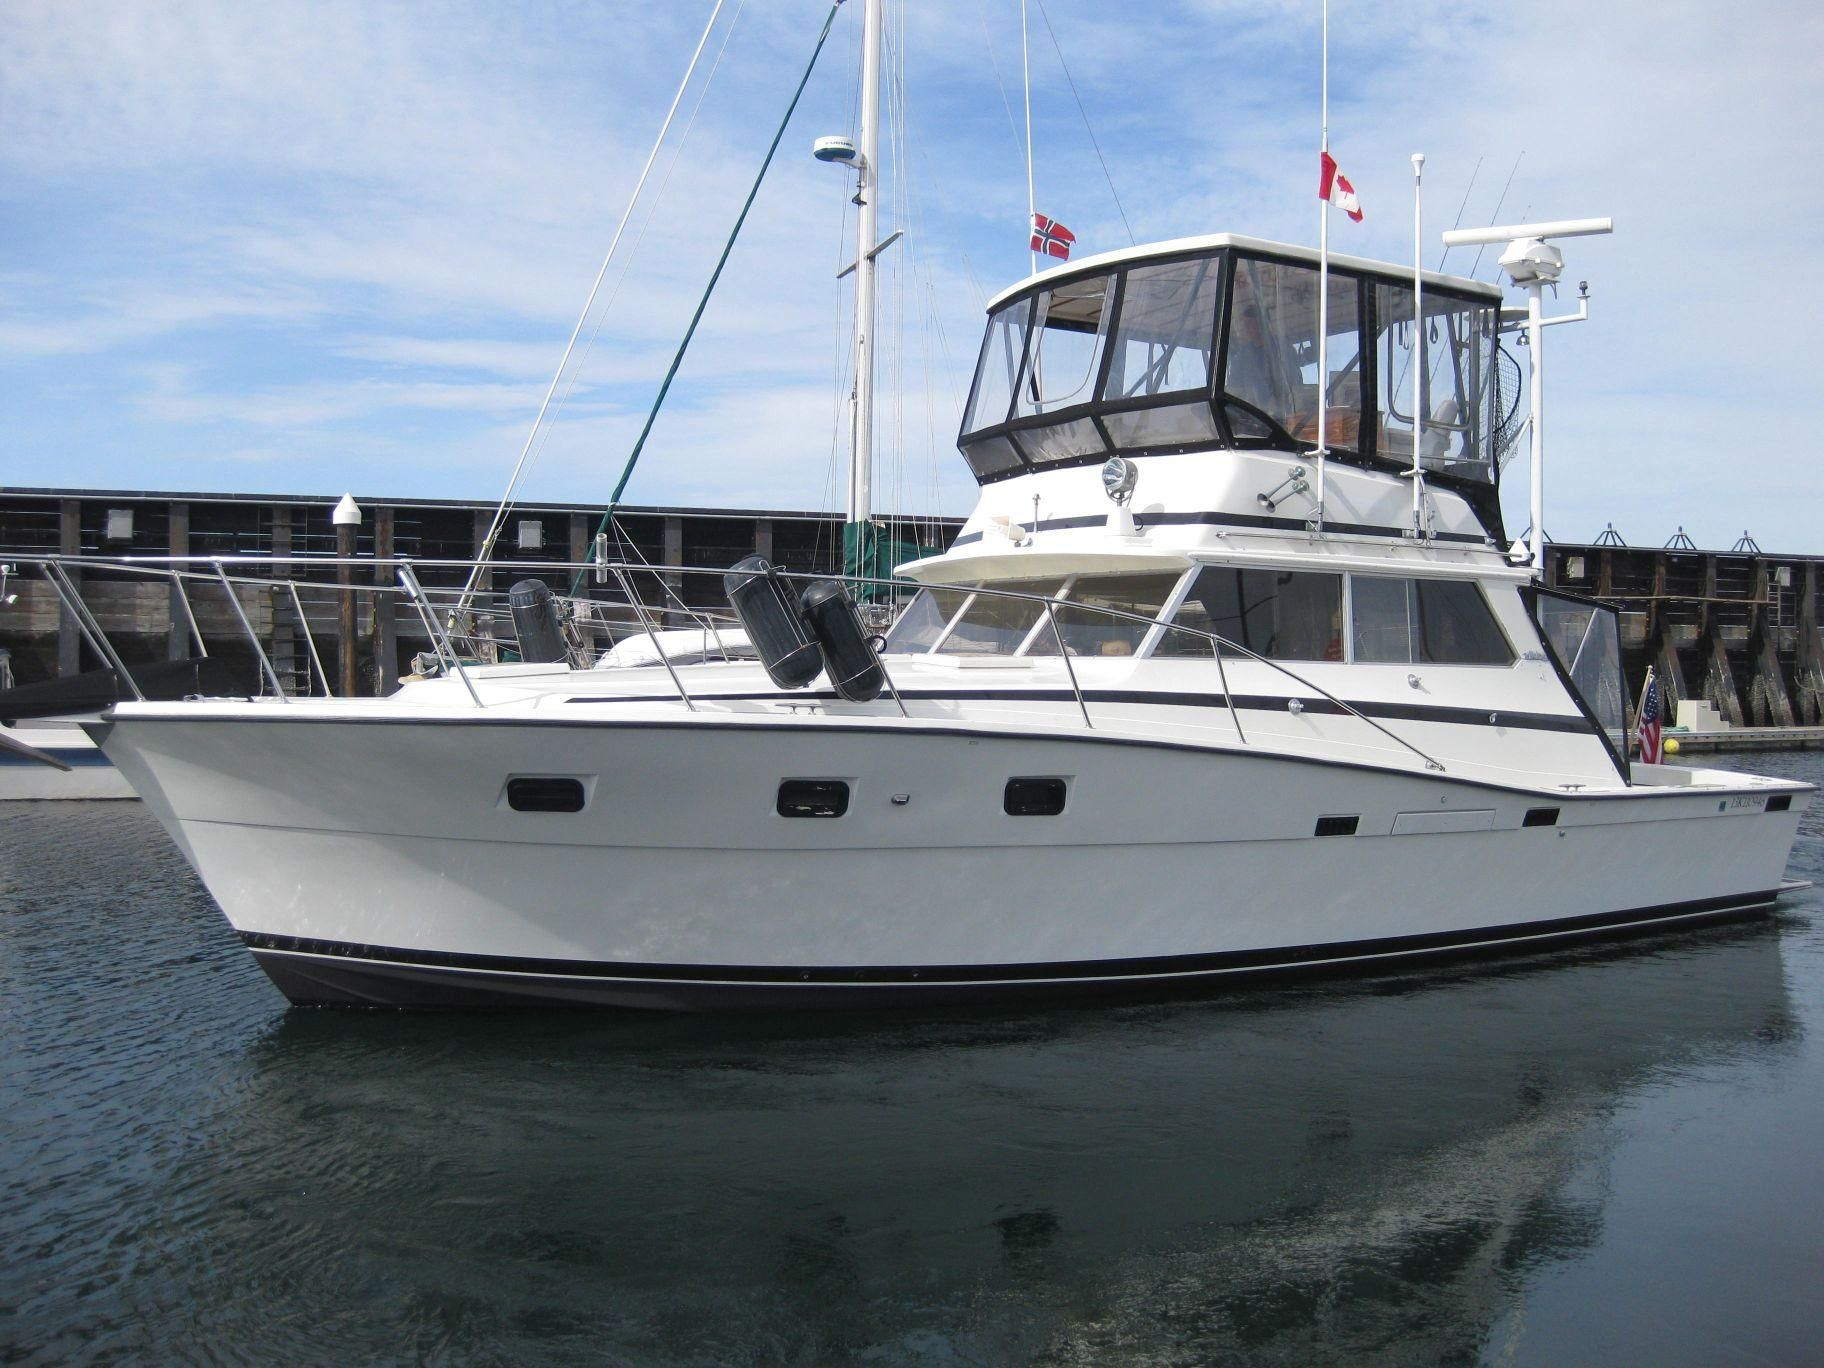 1979 Viking 40 Sedan Convertible Power Boat For Sale Www